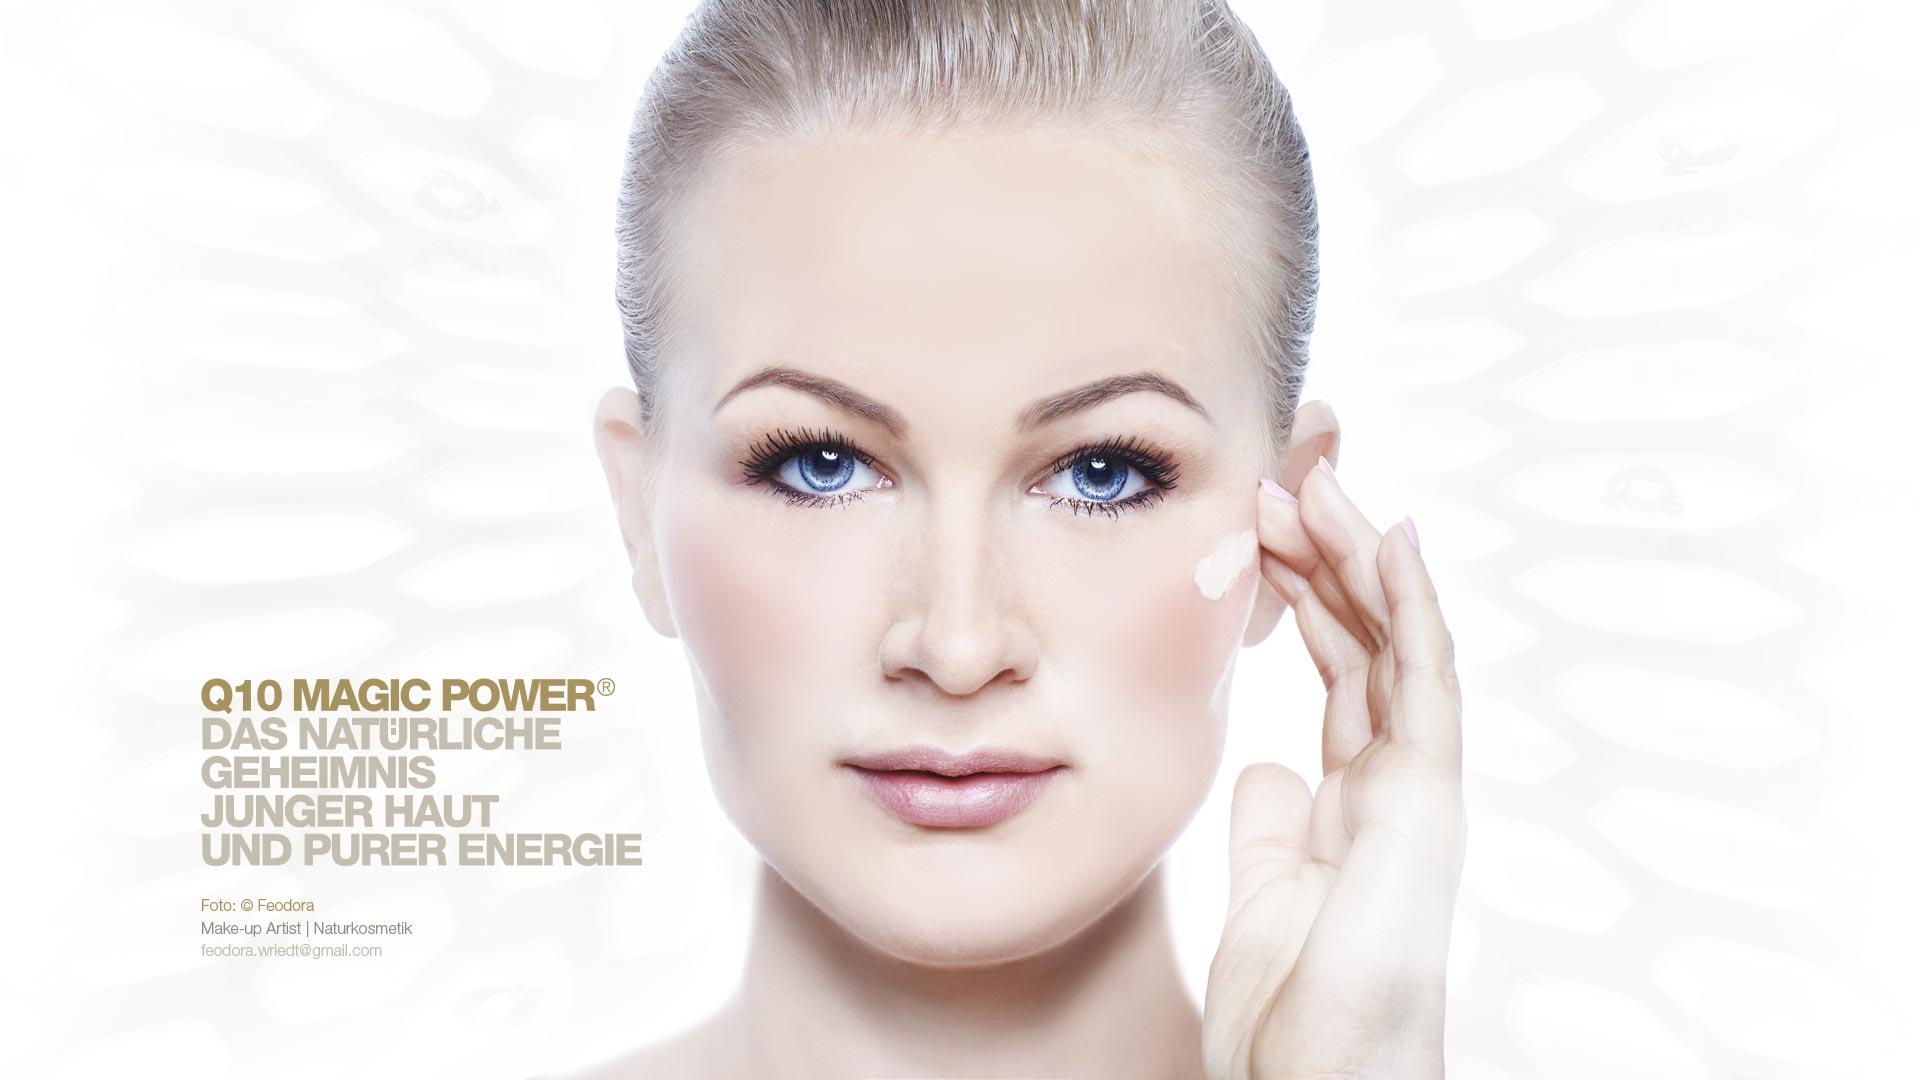 Q10 Magic Power Kosmetik